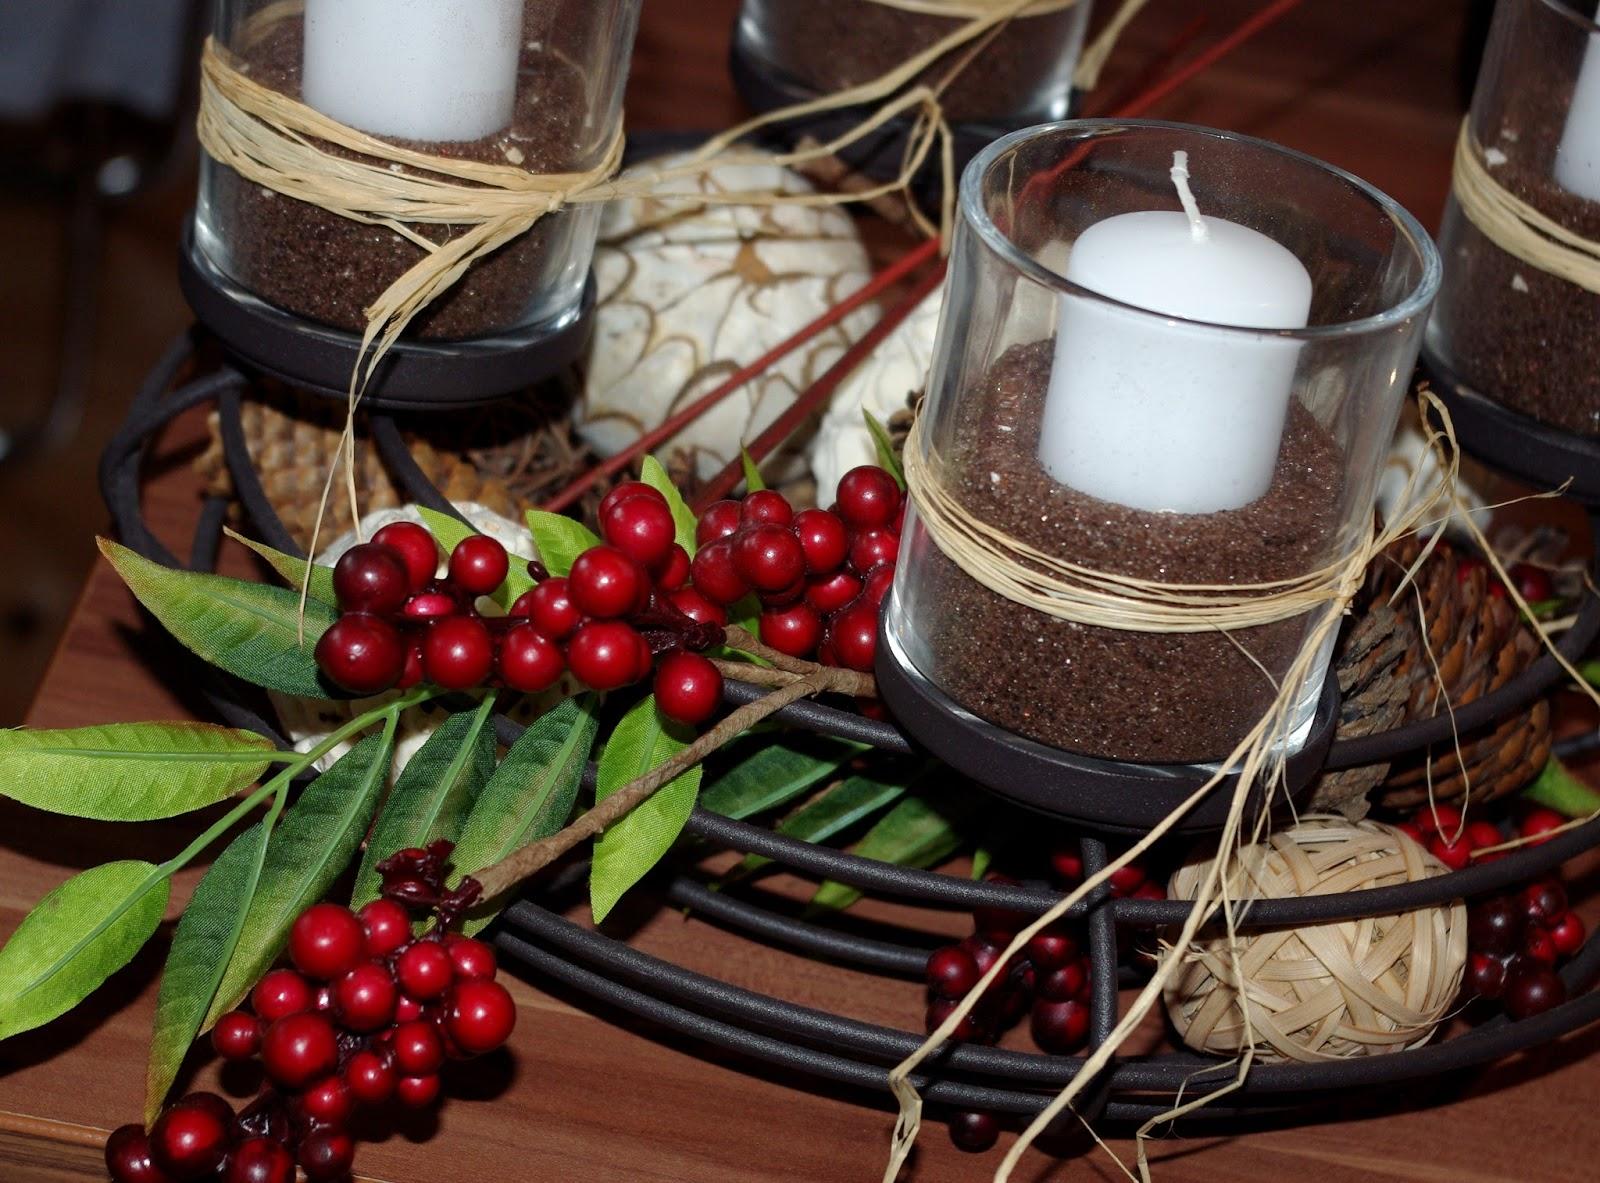 lucciola dekoration herbst inspirationen teil ii tisch deko. Black Bedroom Furniture Sets. Home Design Ideas